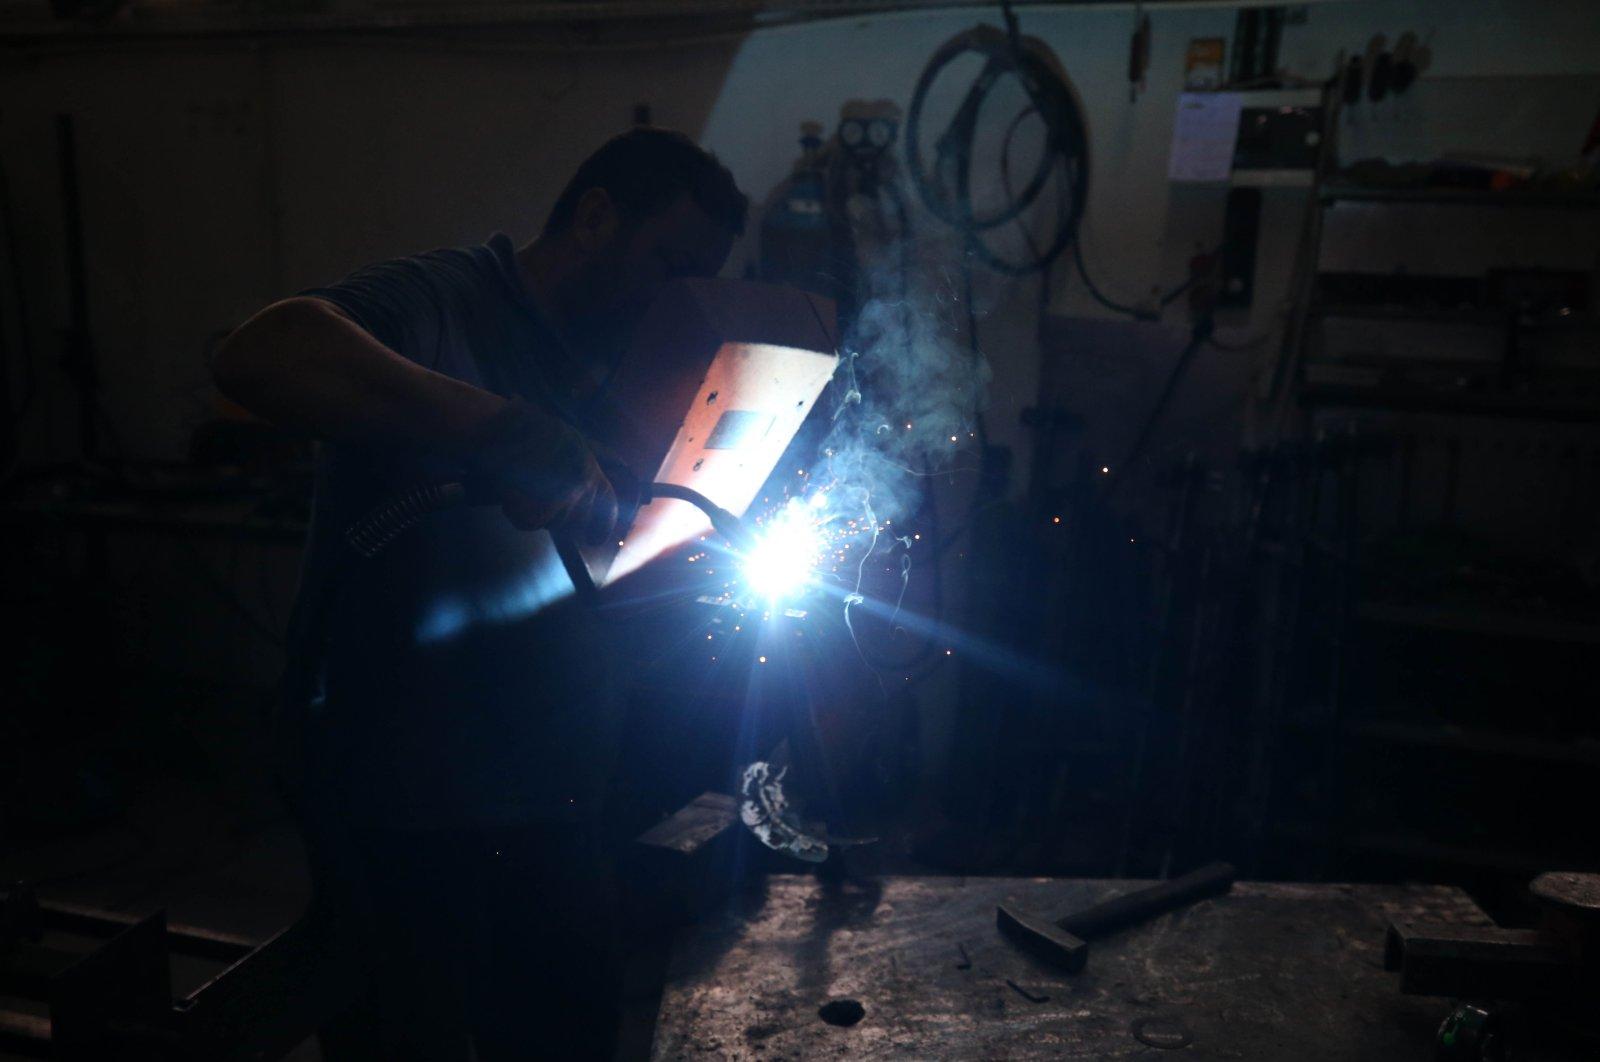 A man works at an atelier in Düzce province, northwestern Turkey, July 16, 2020. (AA Photo)